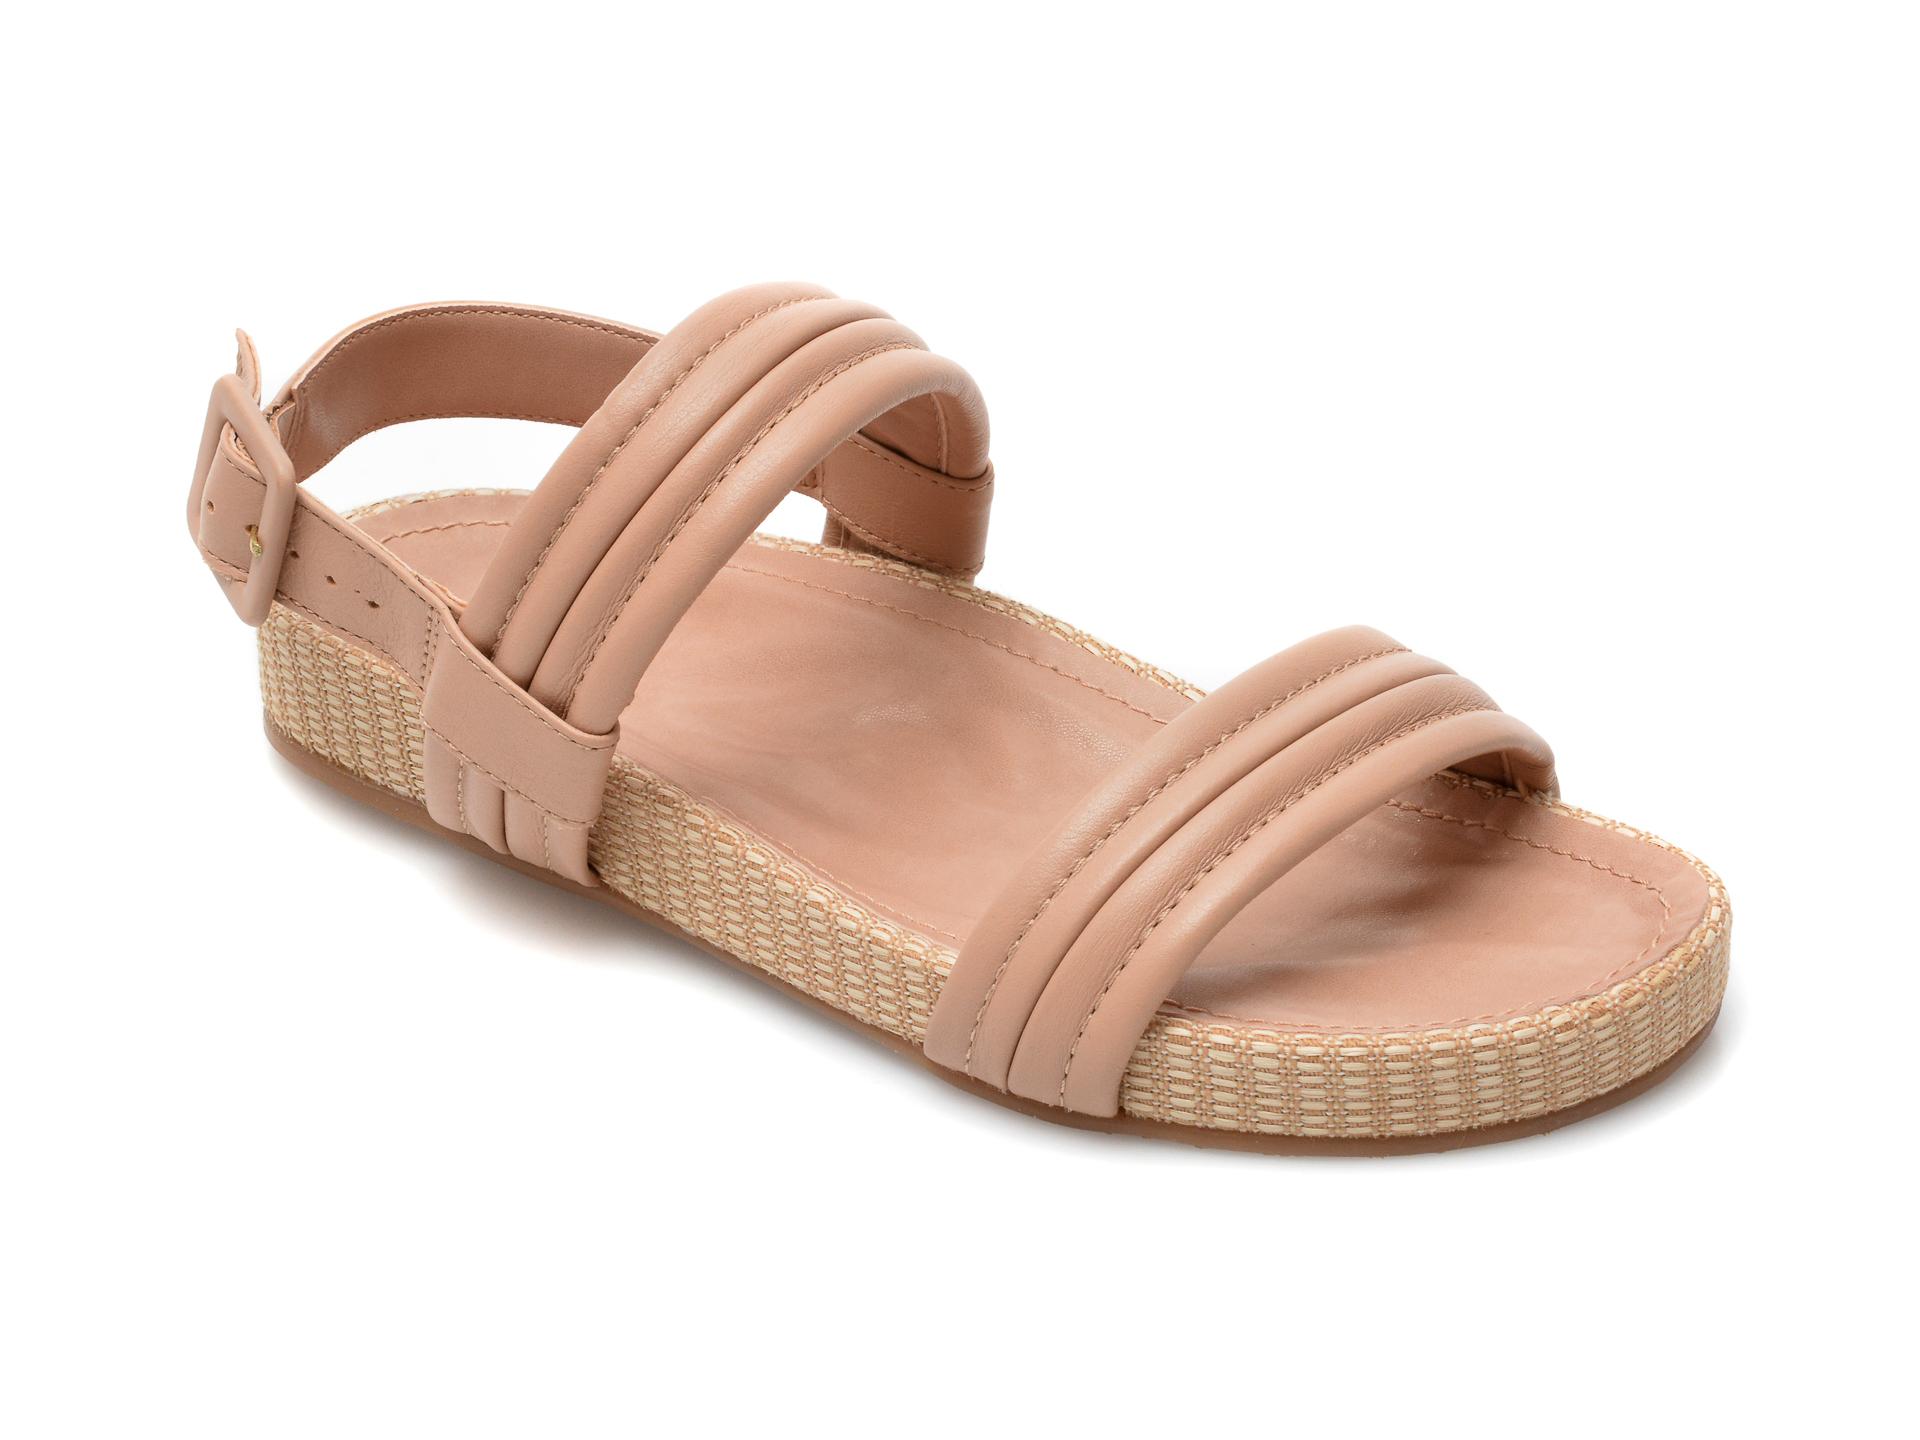 Sandale FLAVIA PASSINI nude, 6019701, din piele naturala